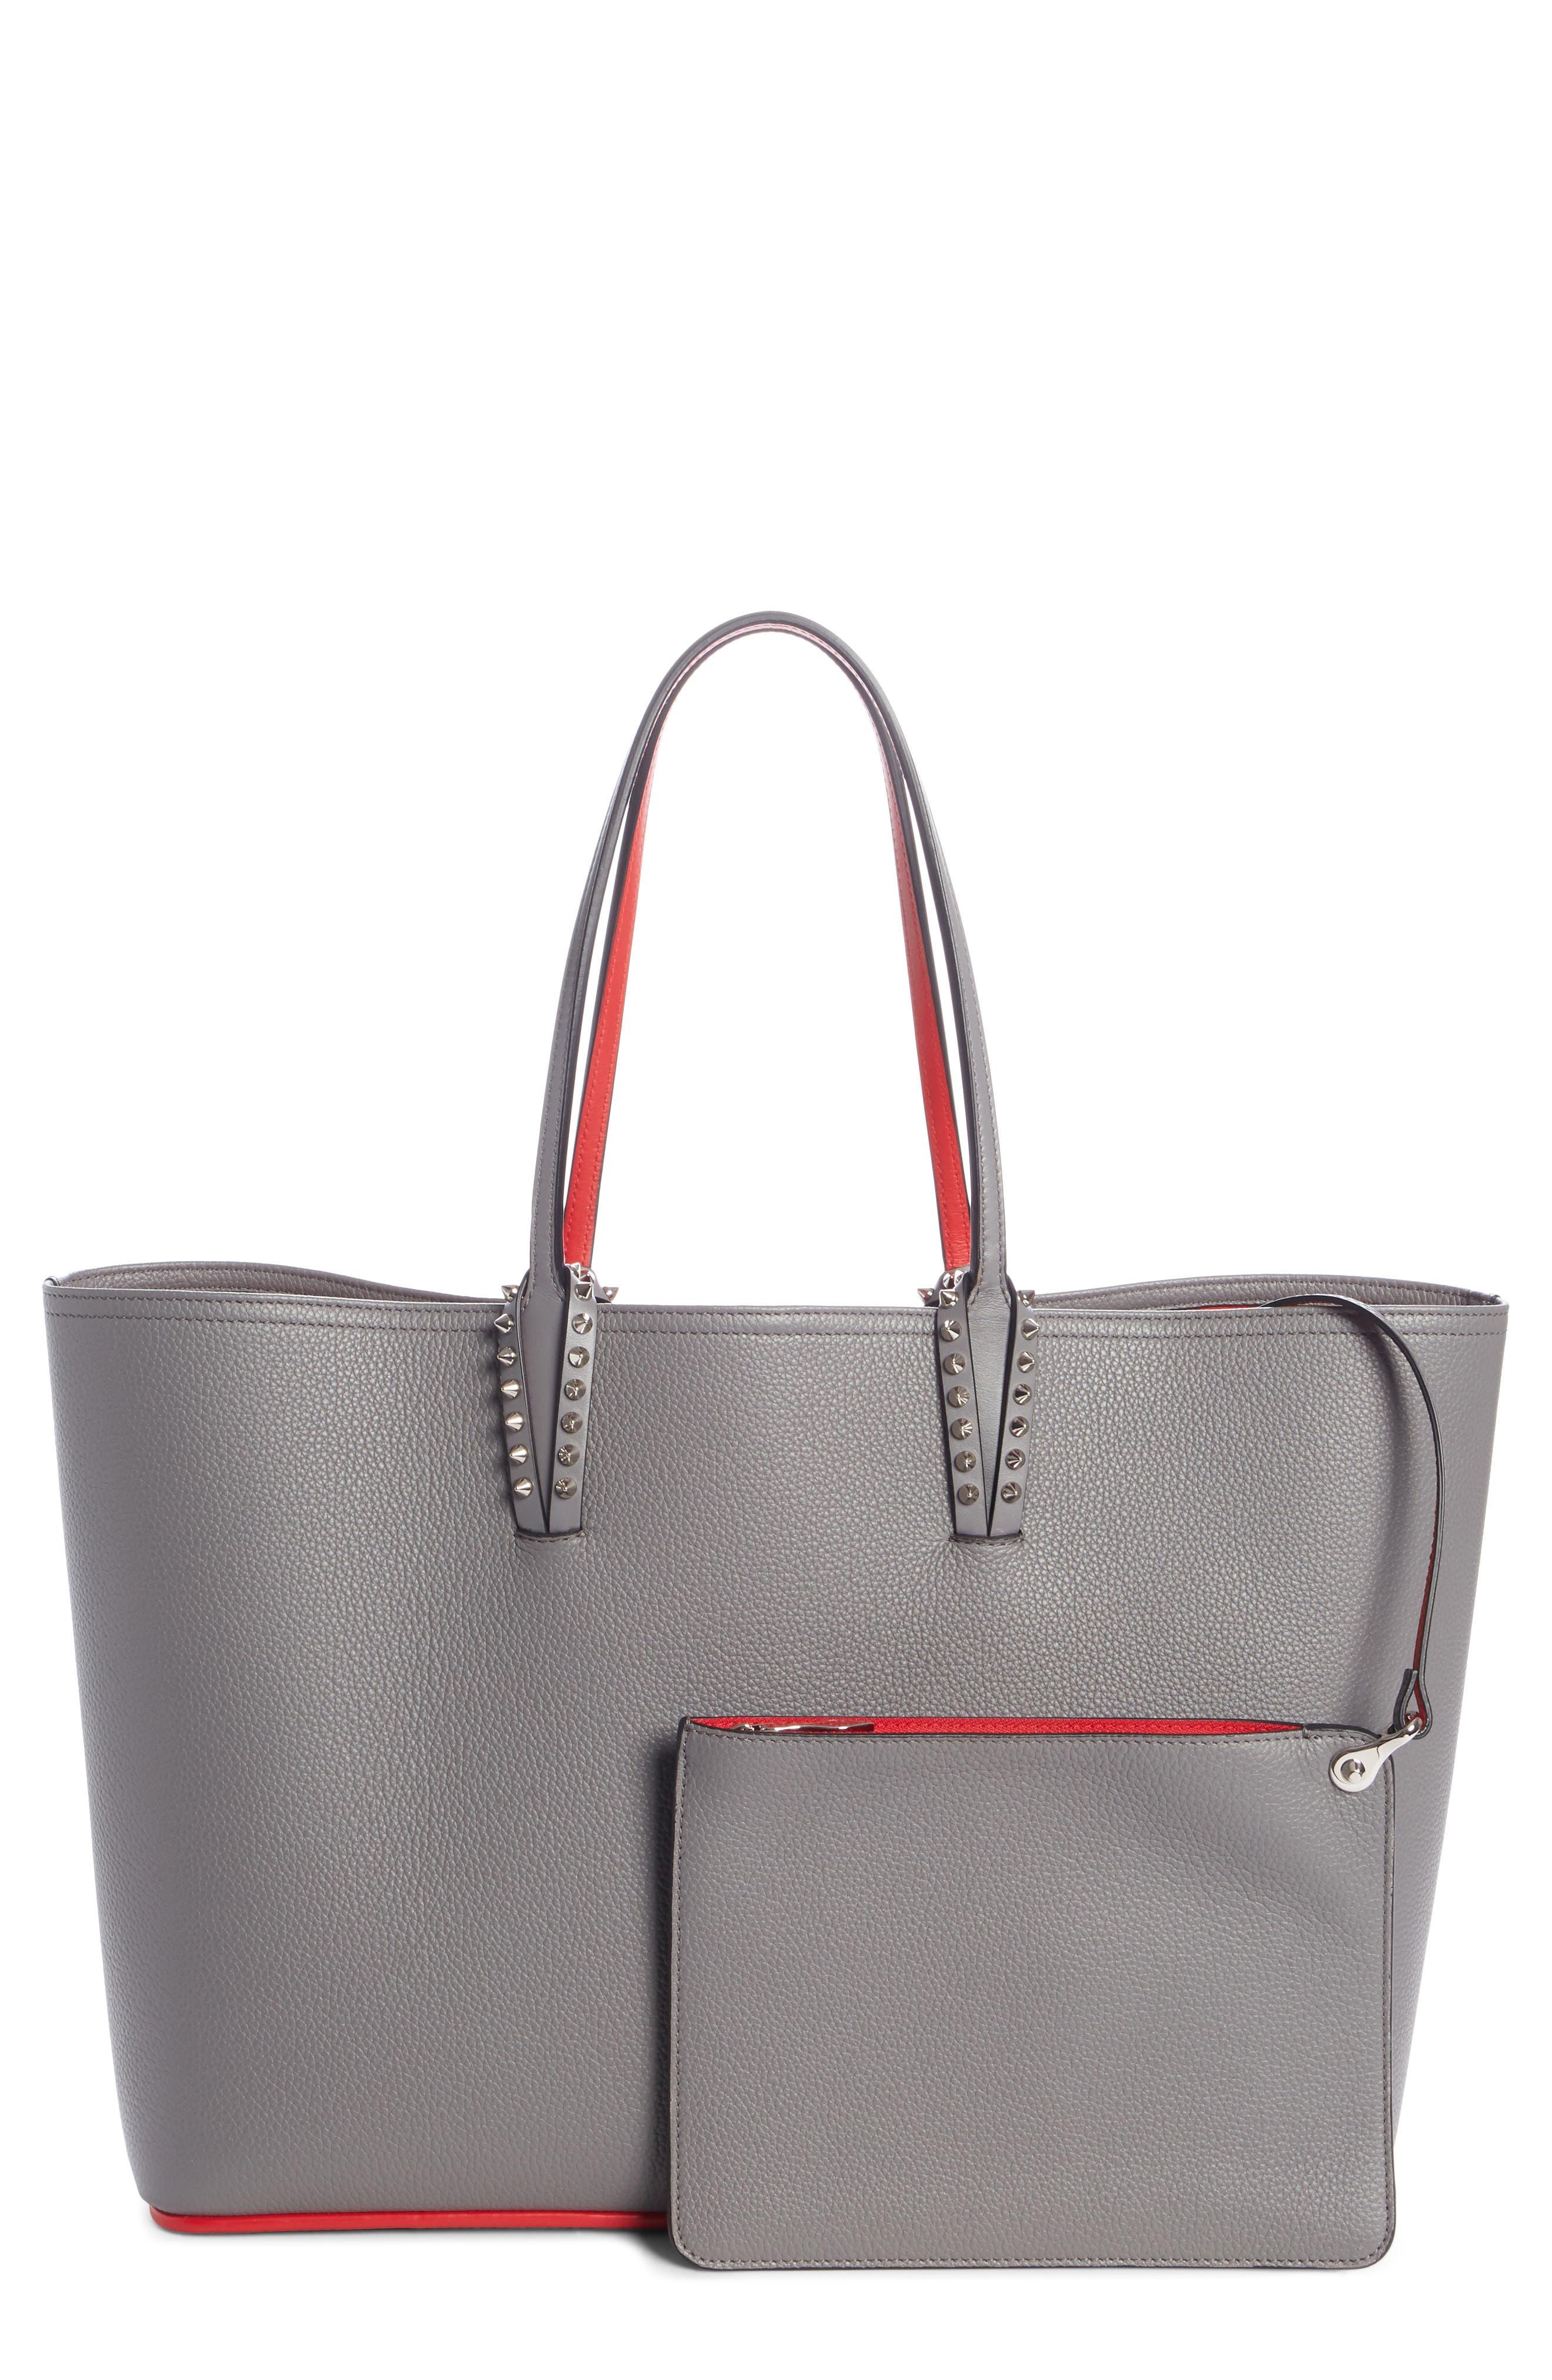 3c3f83c914c0 Christian Louboutin Women s Handbags   Purses